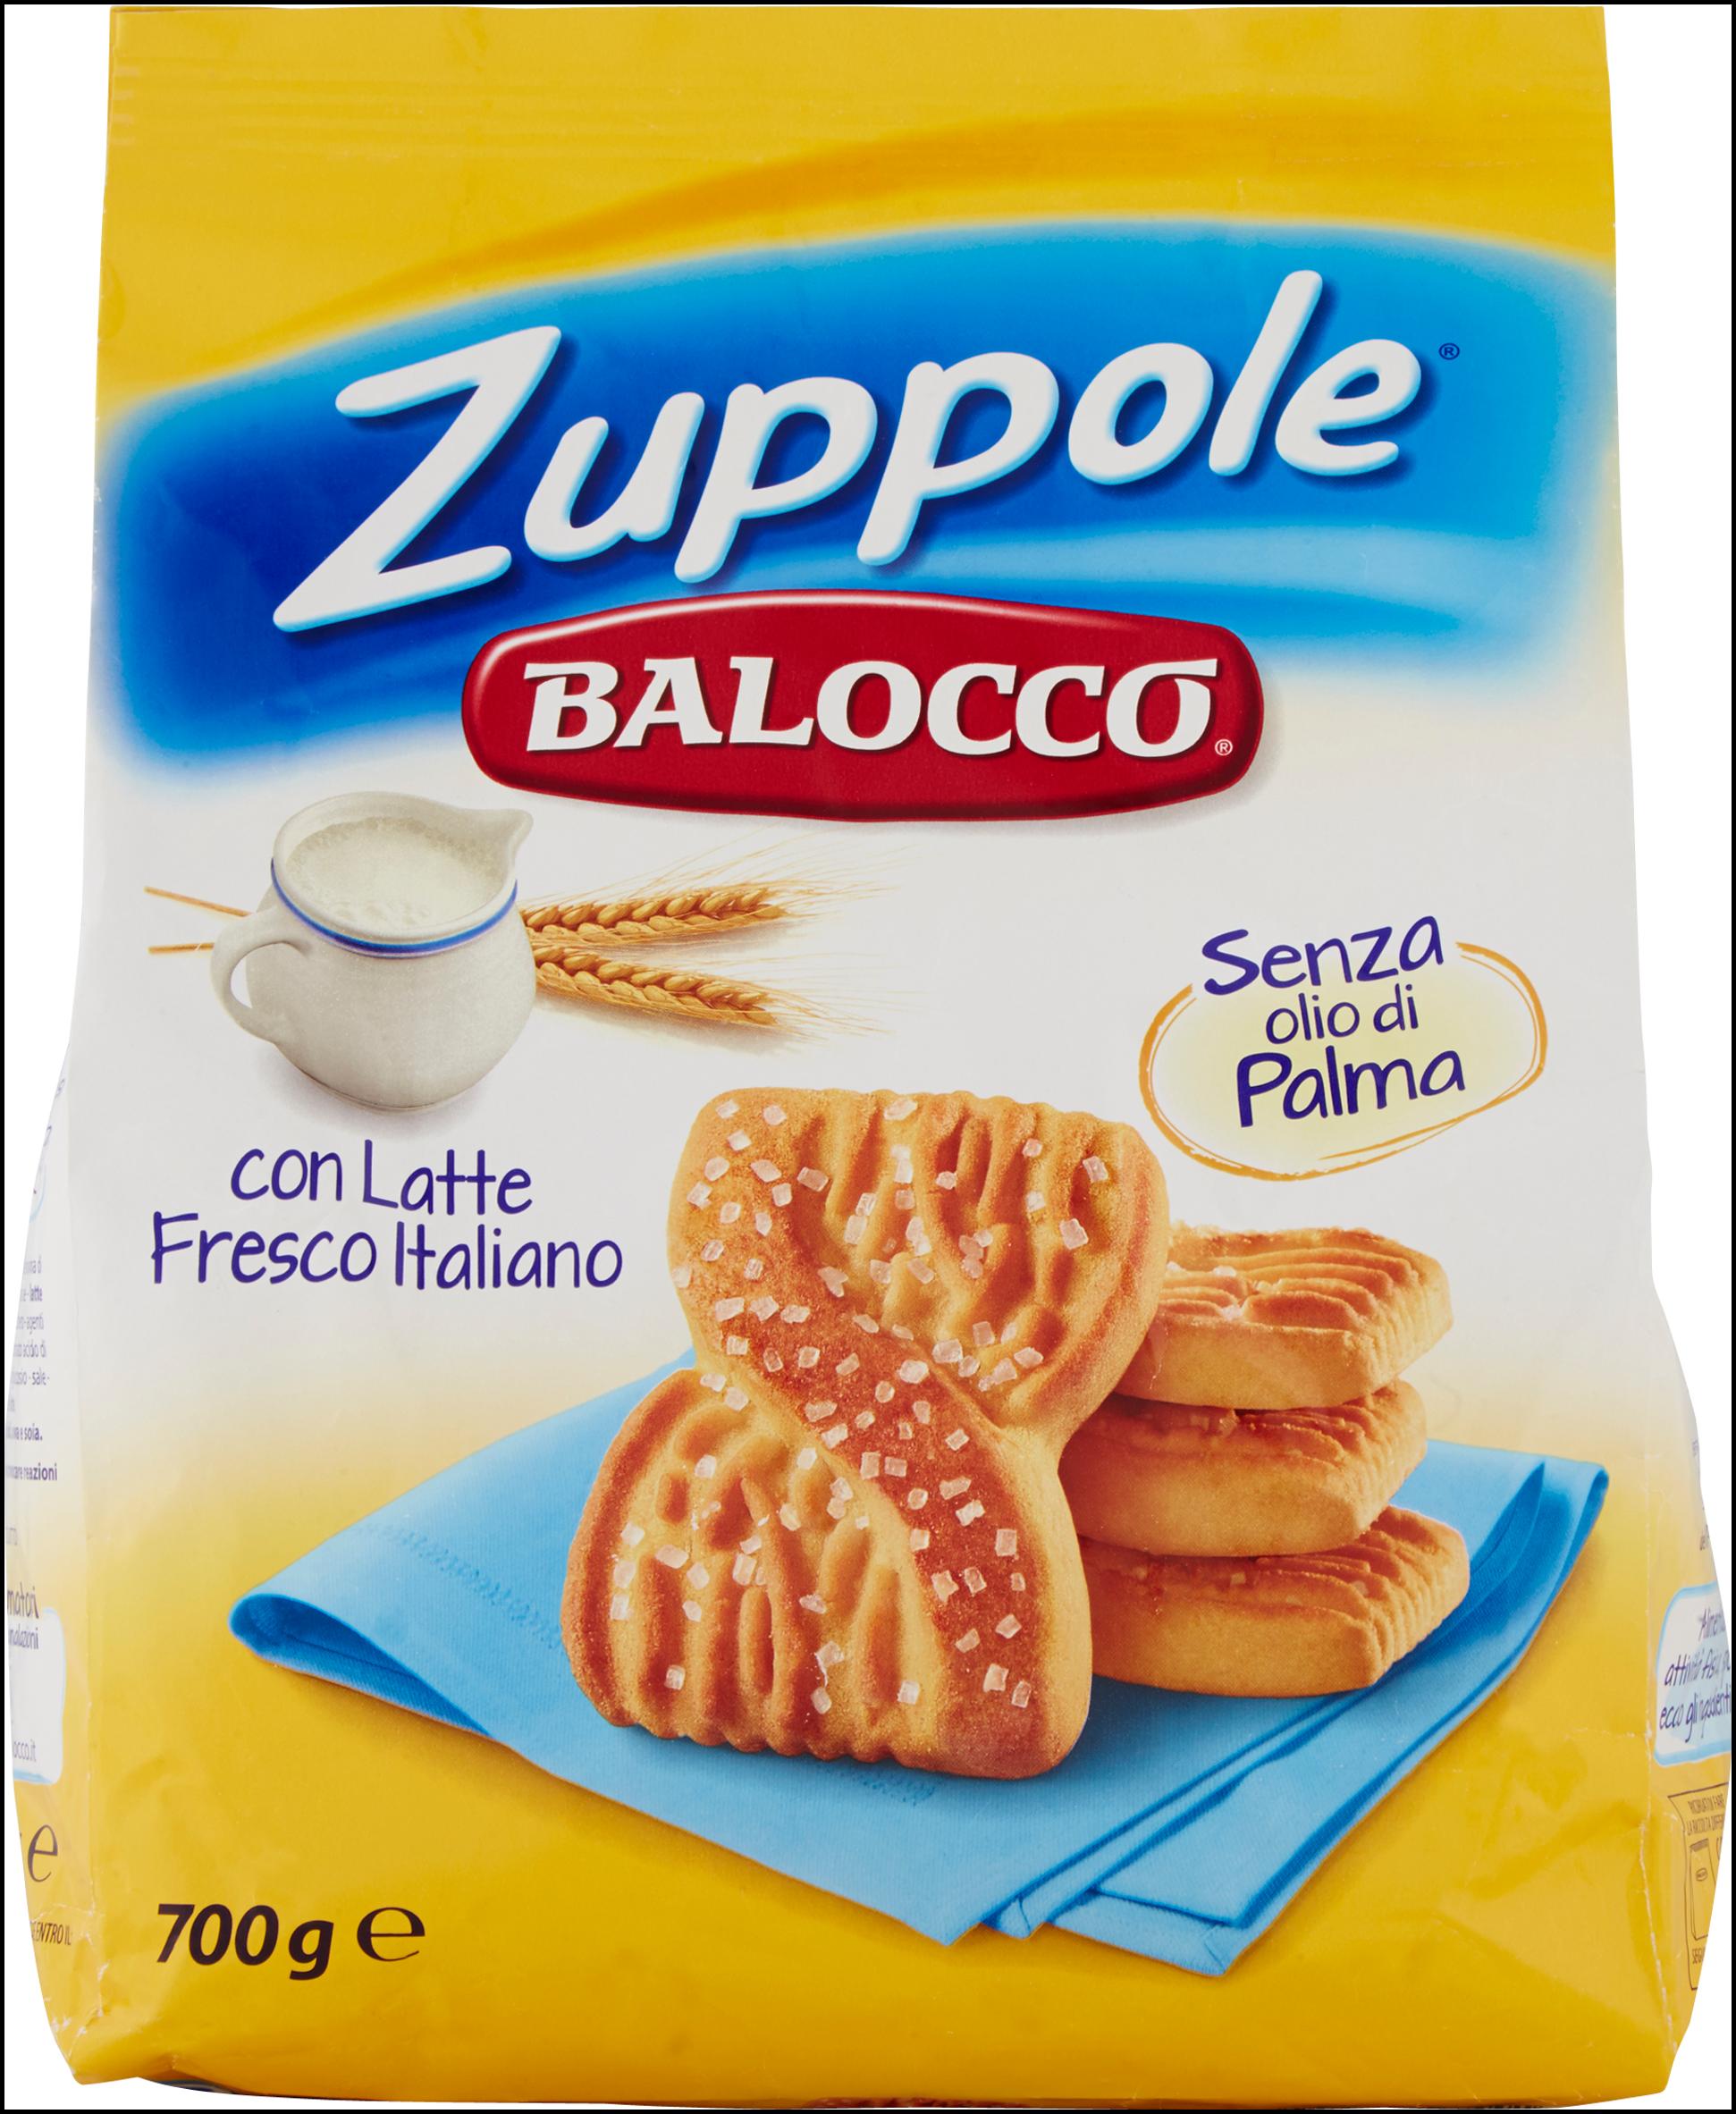 BISC.ZUPPOLE NO PALMA BALOCCO G700